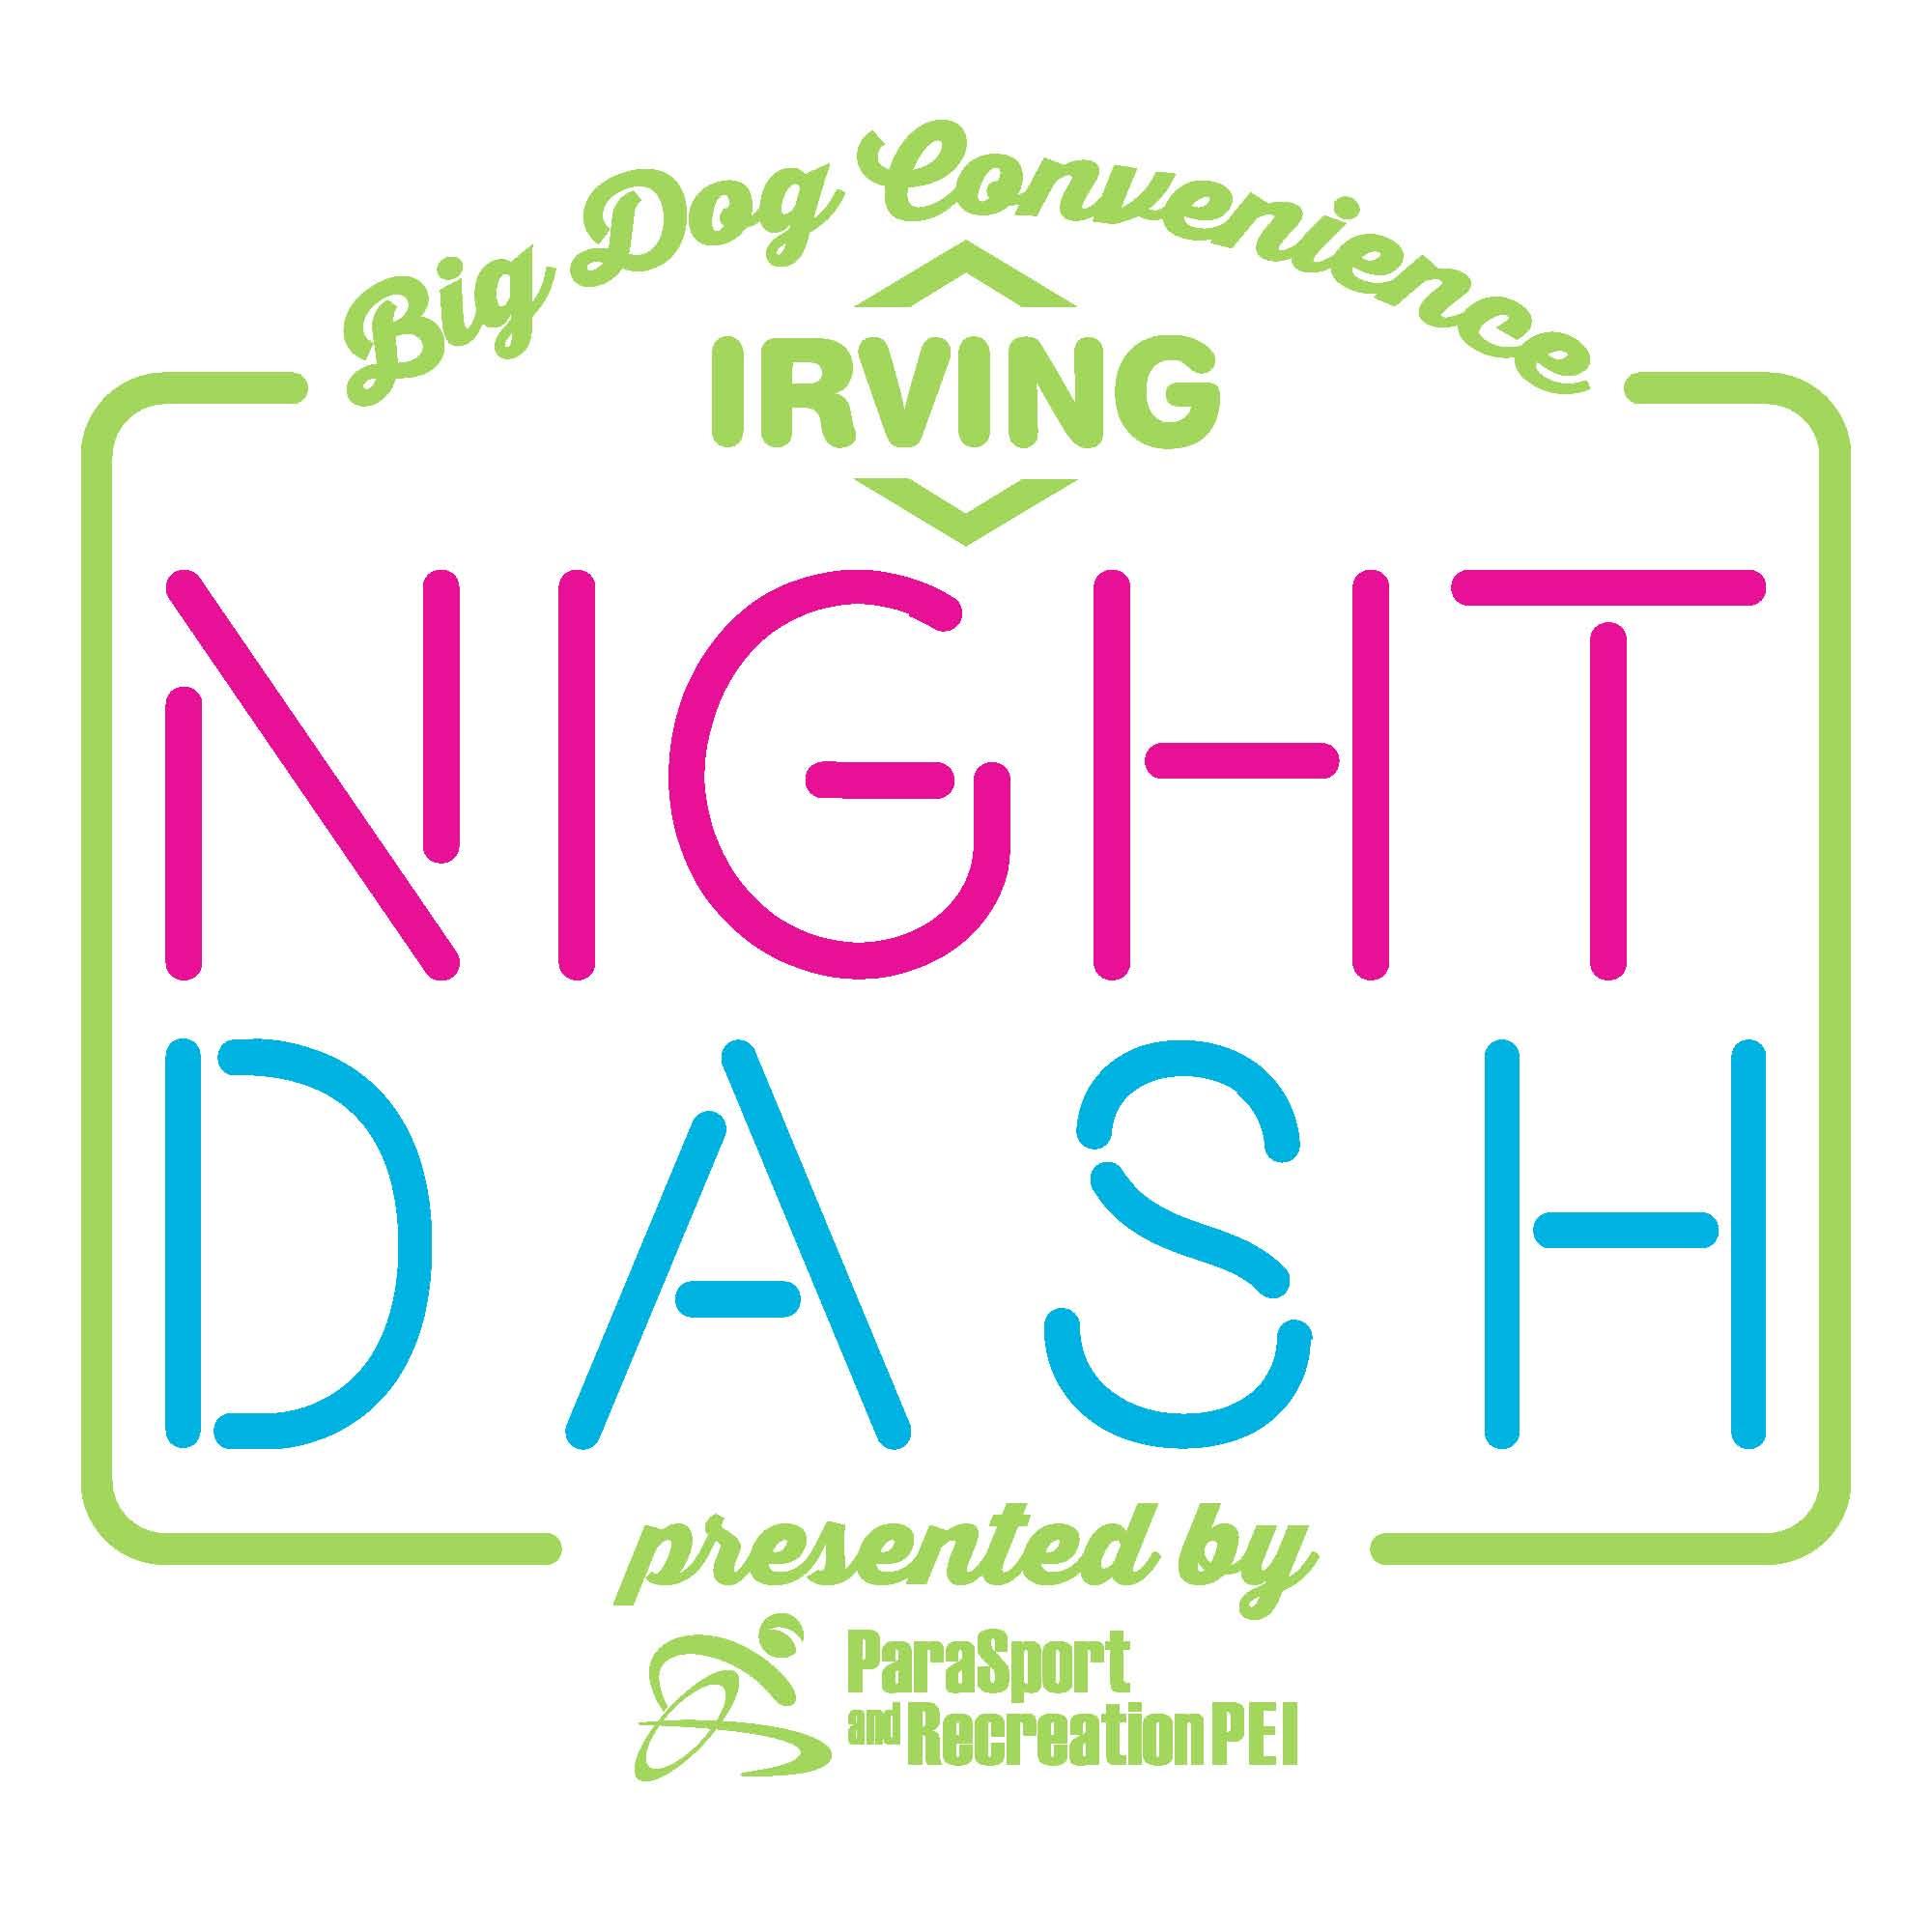 Night Dash Full Colour Logo(1)